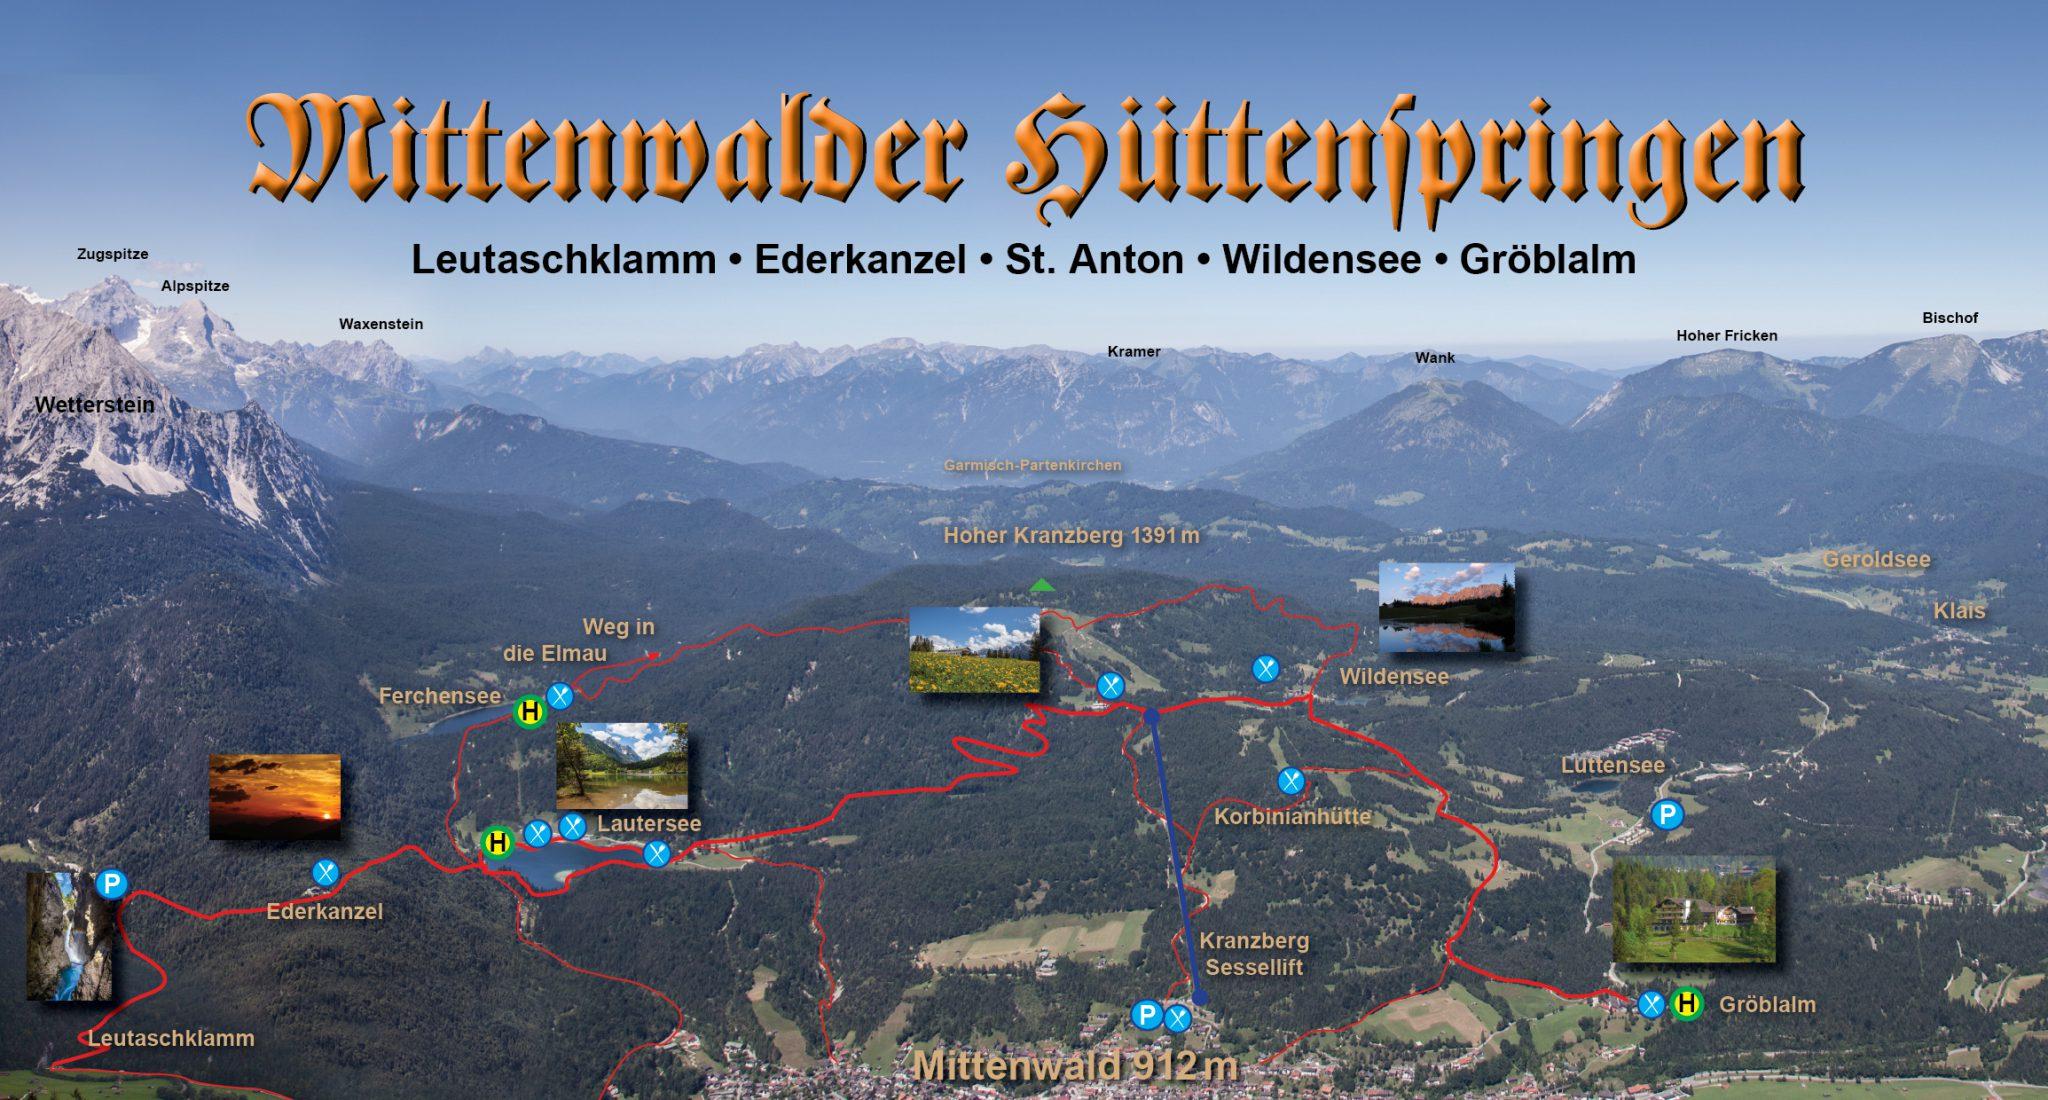 Beschreibung des Kranzberg Wandergebietes bei Mittenwald